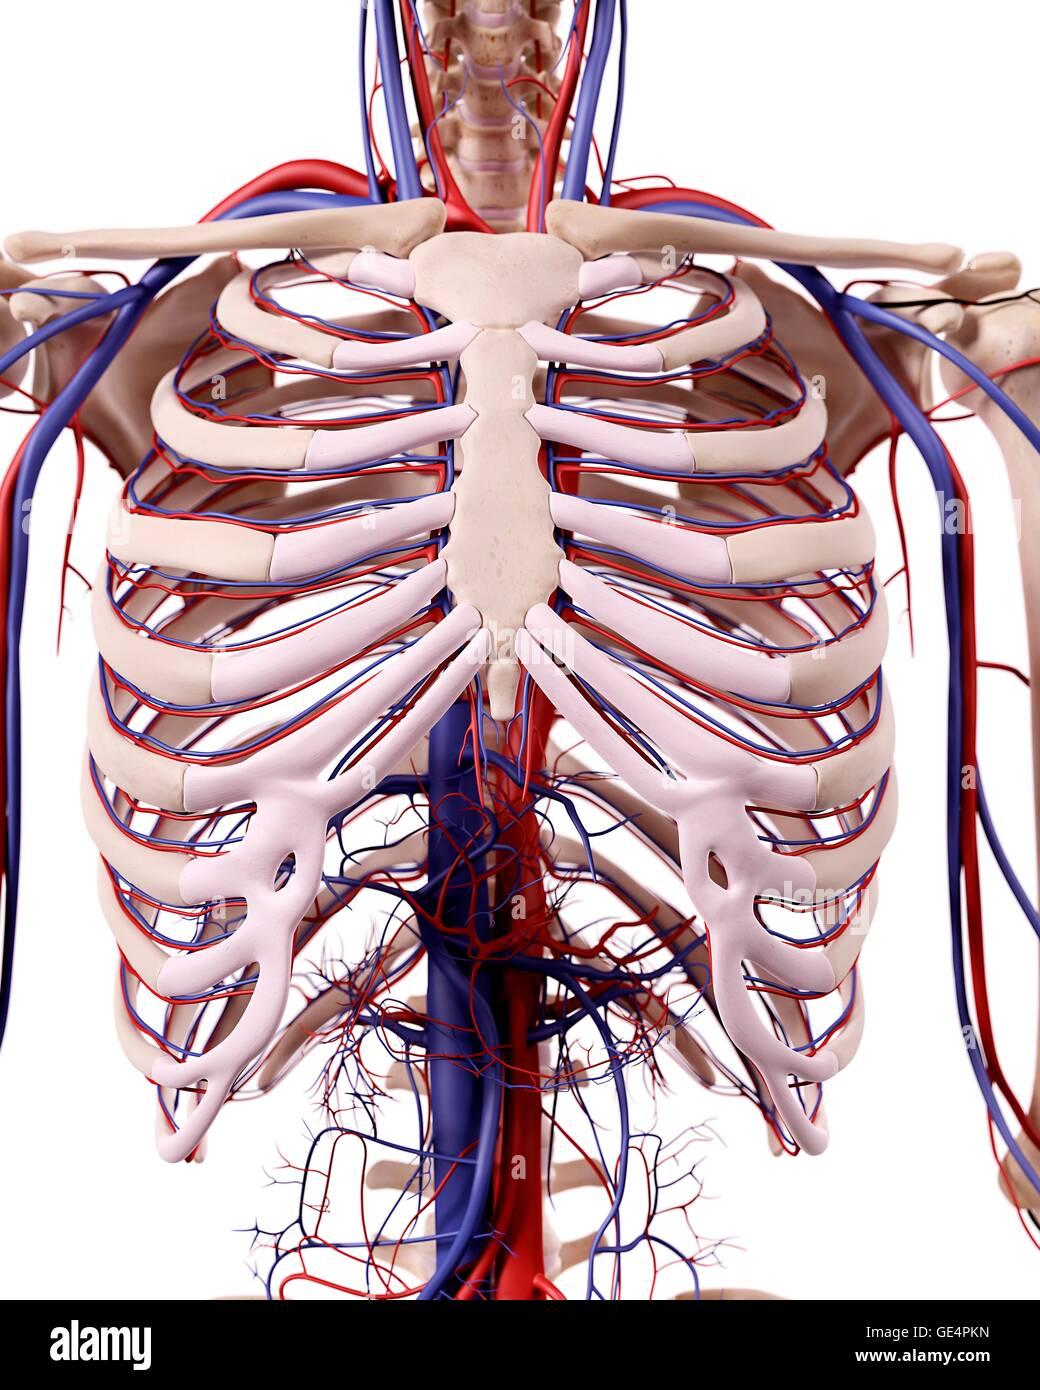 Human Thoracic Anatomy Illustration Stock Photo 111973001 Alamy